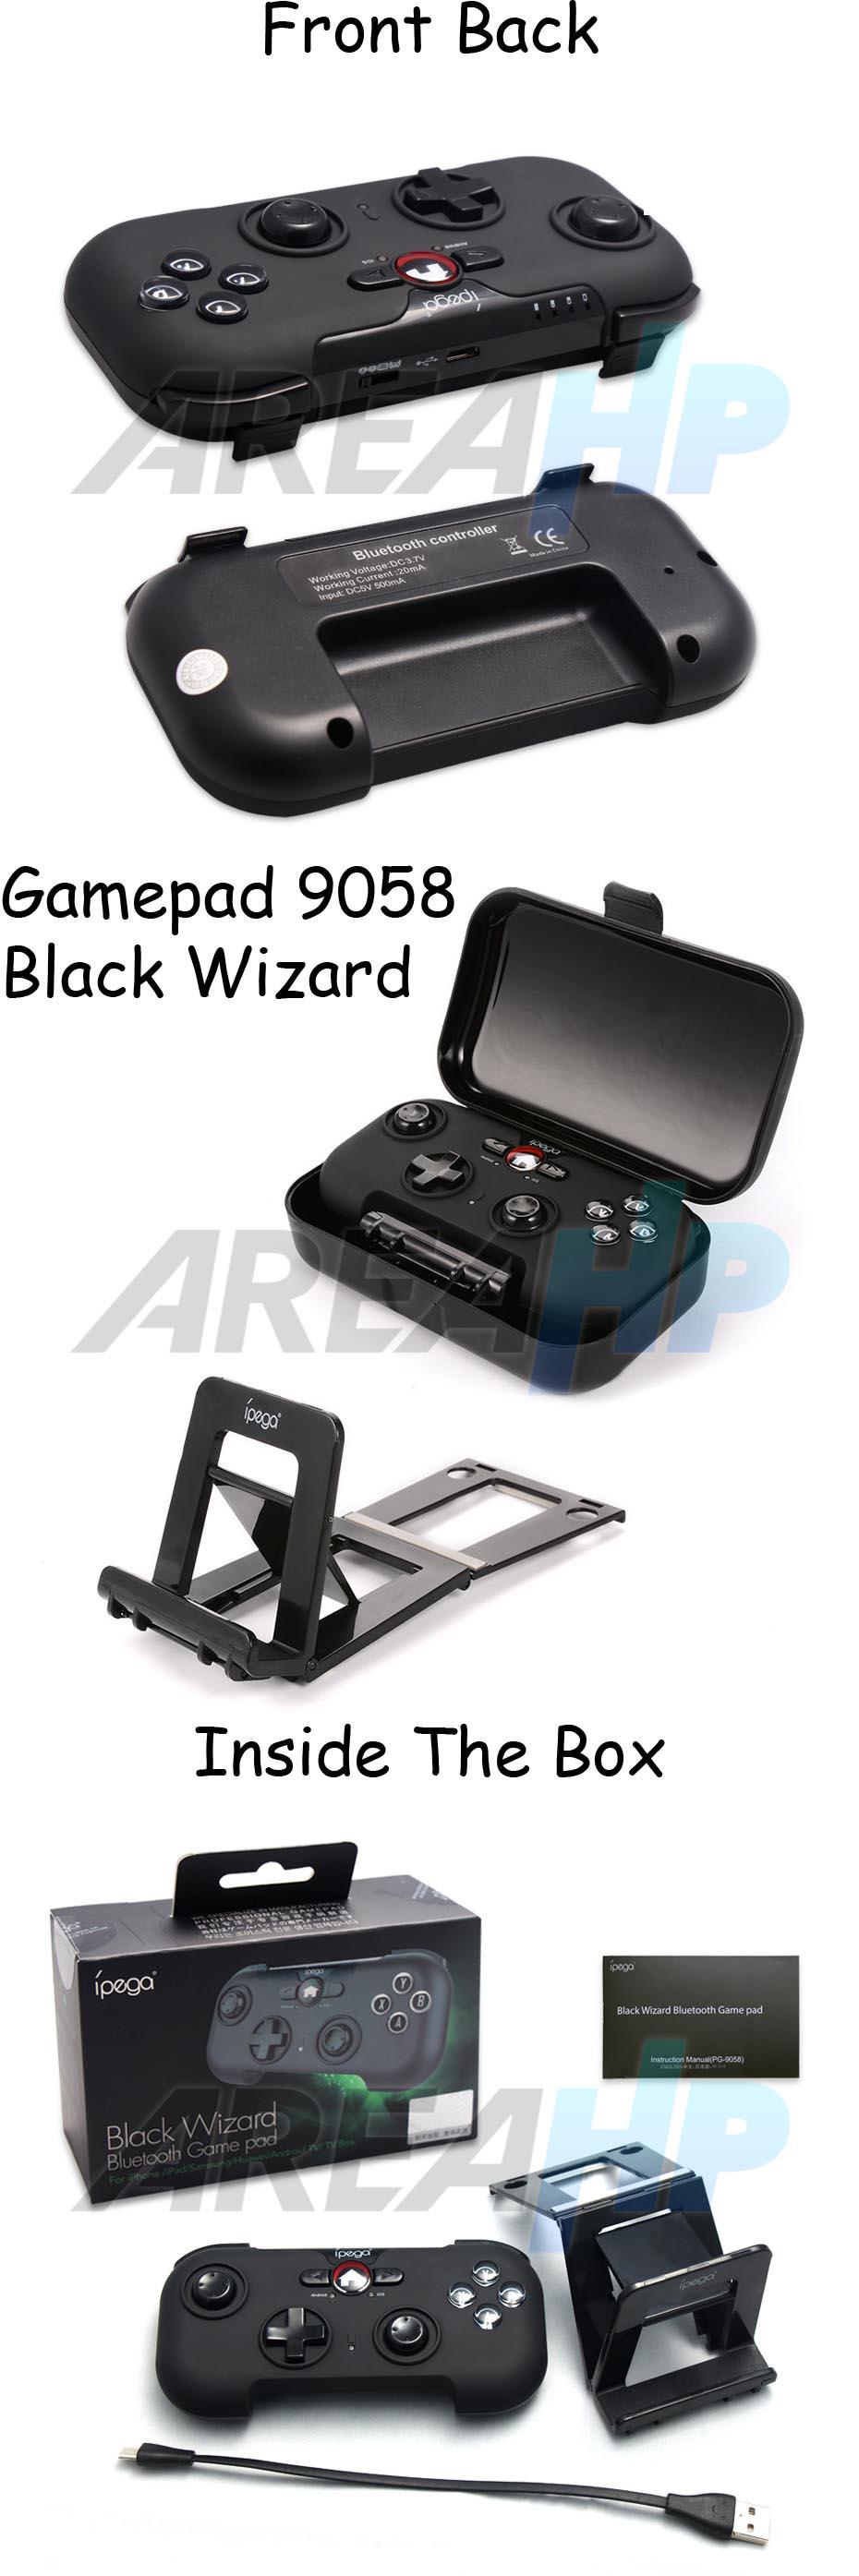 Ipega Gamepad PG-9058 Black Wizard Overview